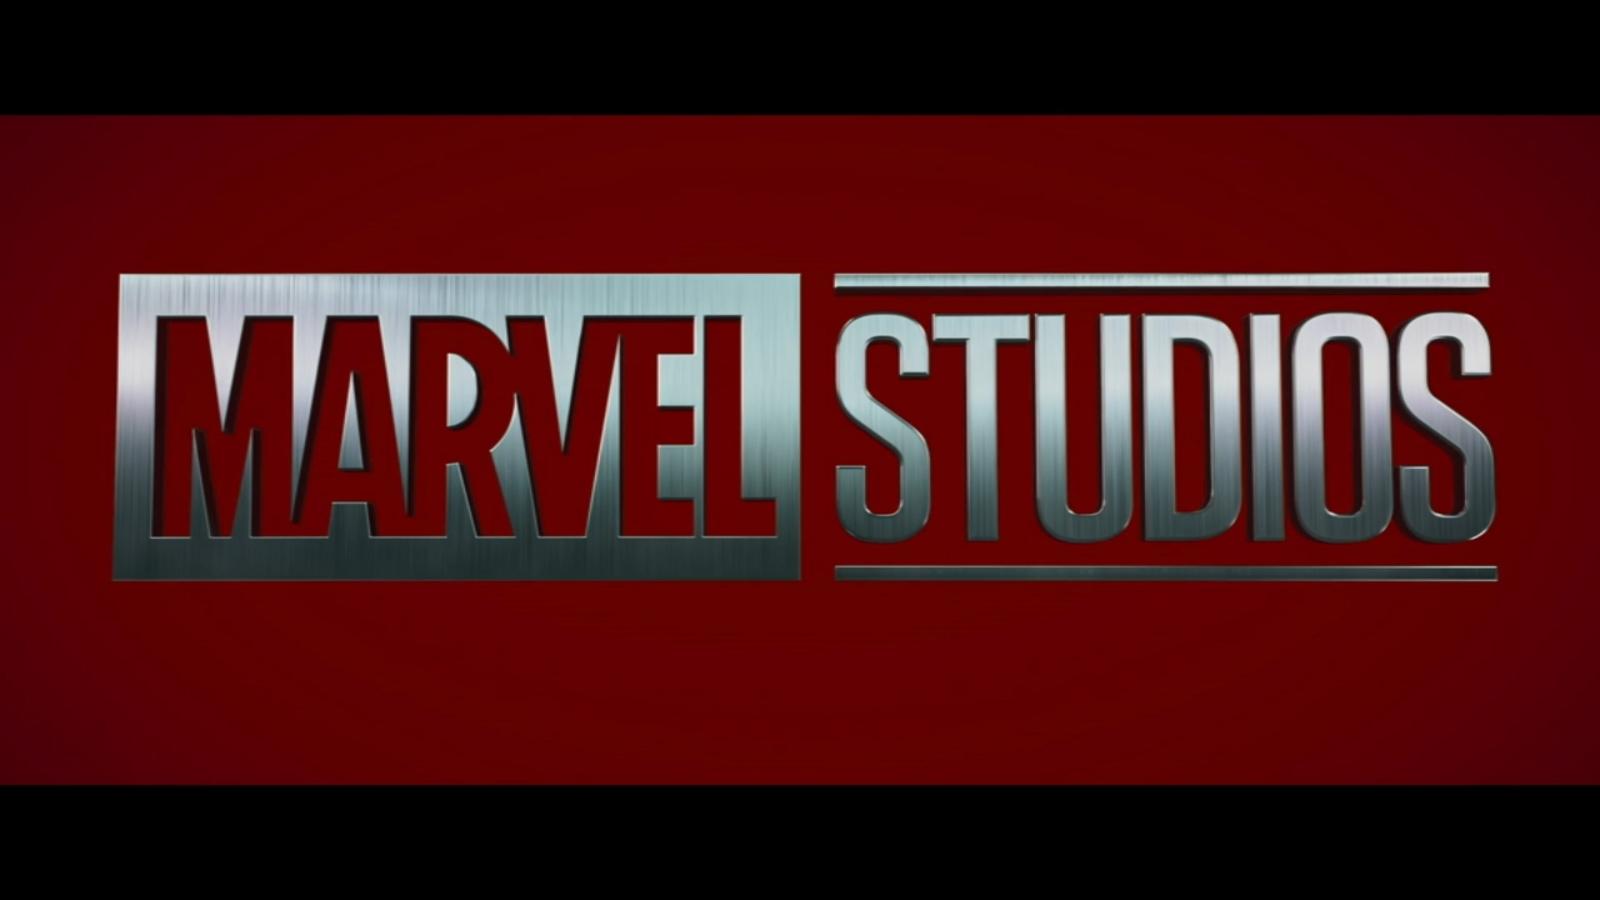 Marvel Celebrates the Movies:' Marvel Studios previews upcoming films,  looks at back at MCU so far - 6abc Philadelphia